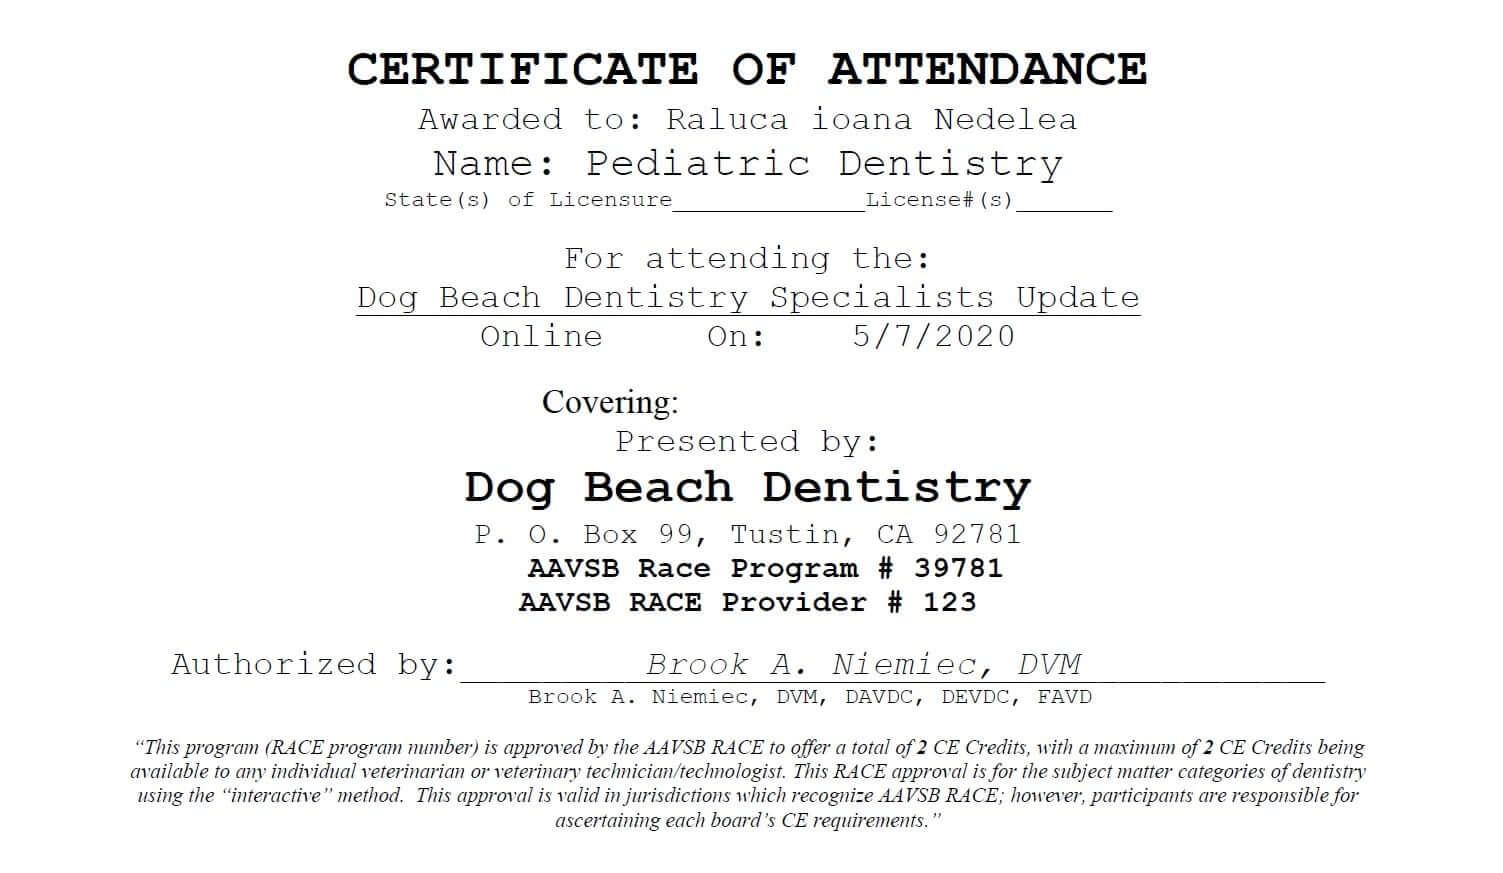 Certificari Pediatric Dentistry 2020